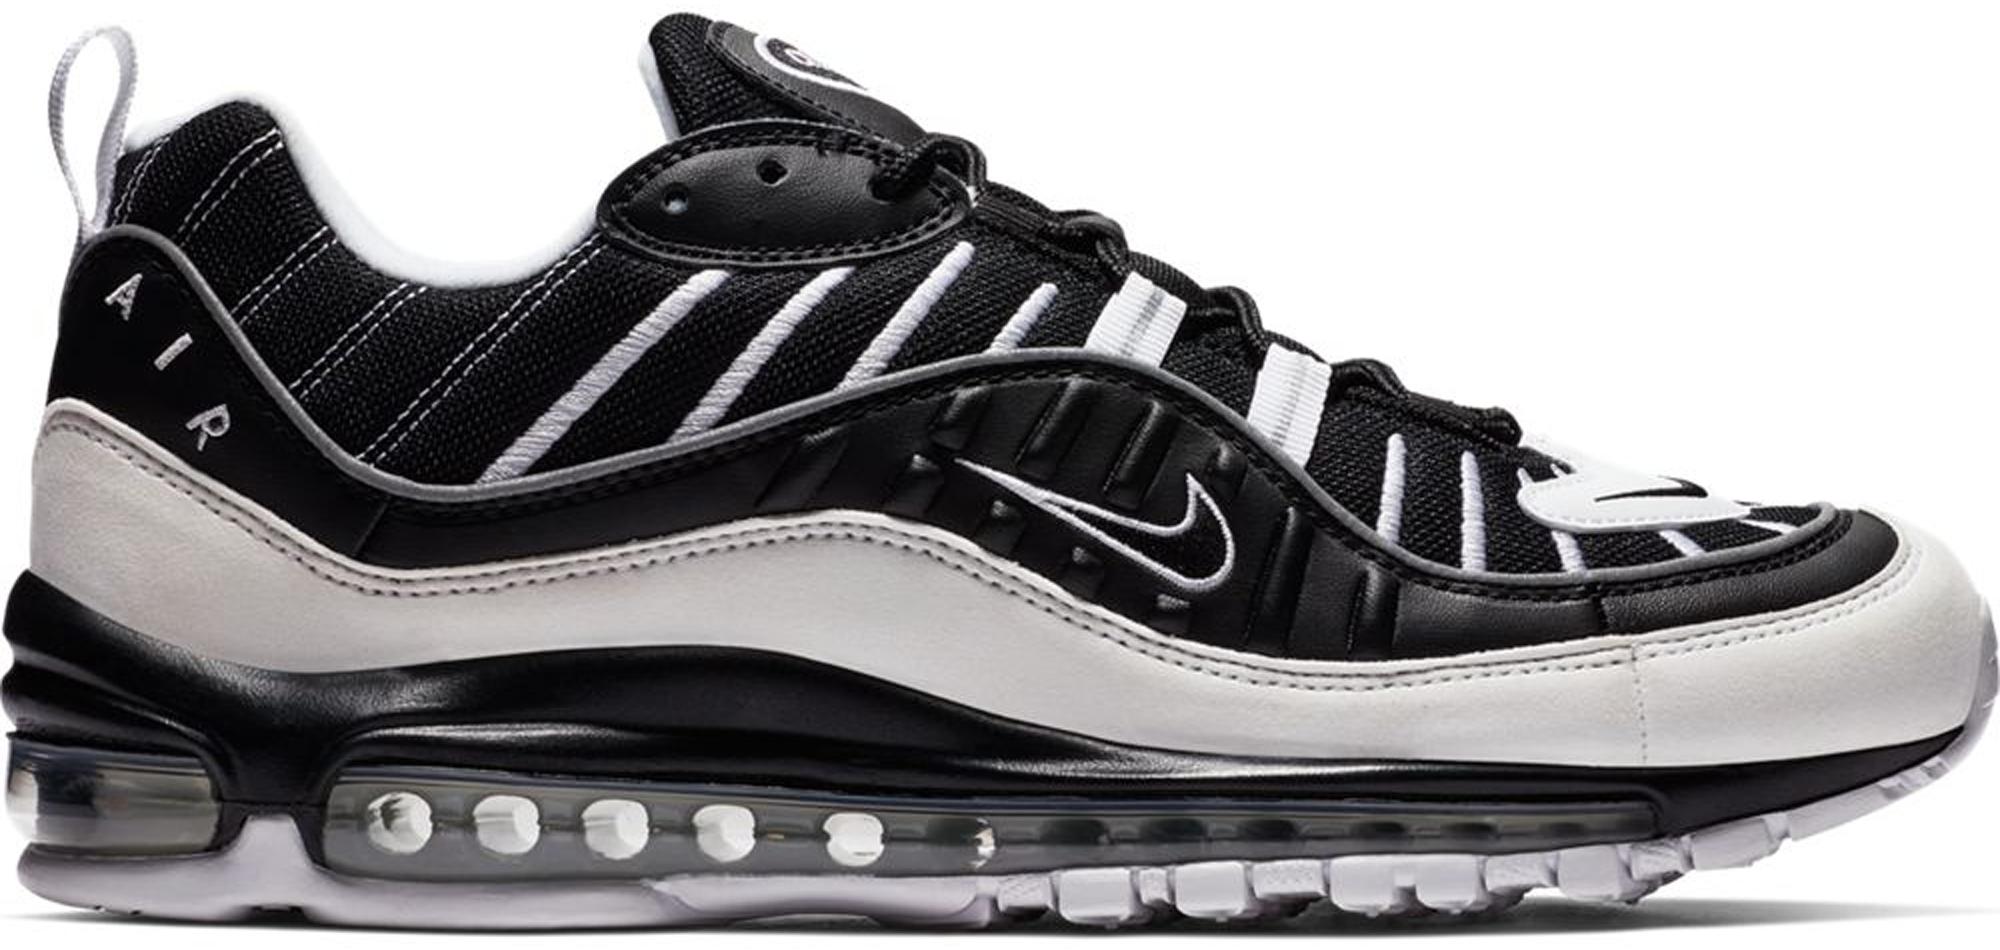 Nike Air Max 98 White Black - 640744-010